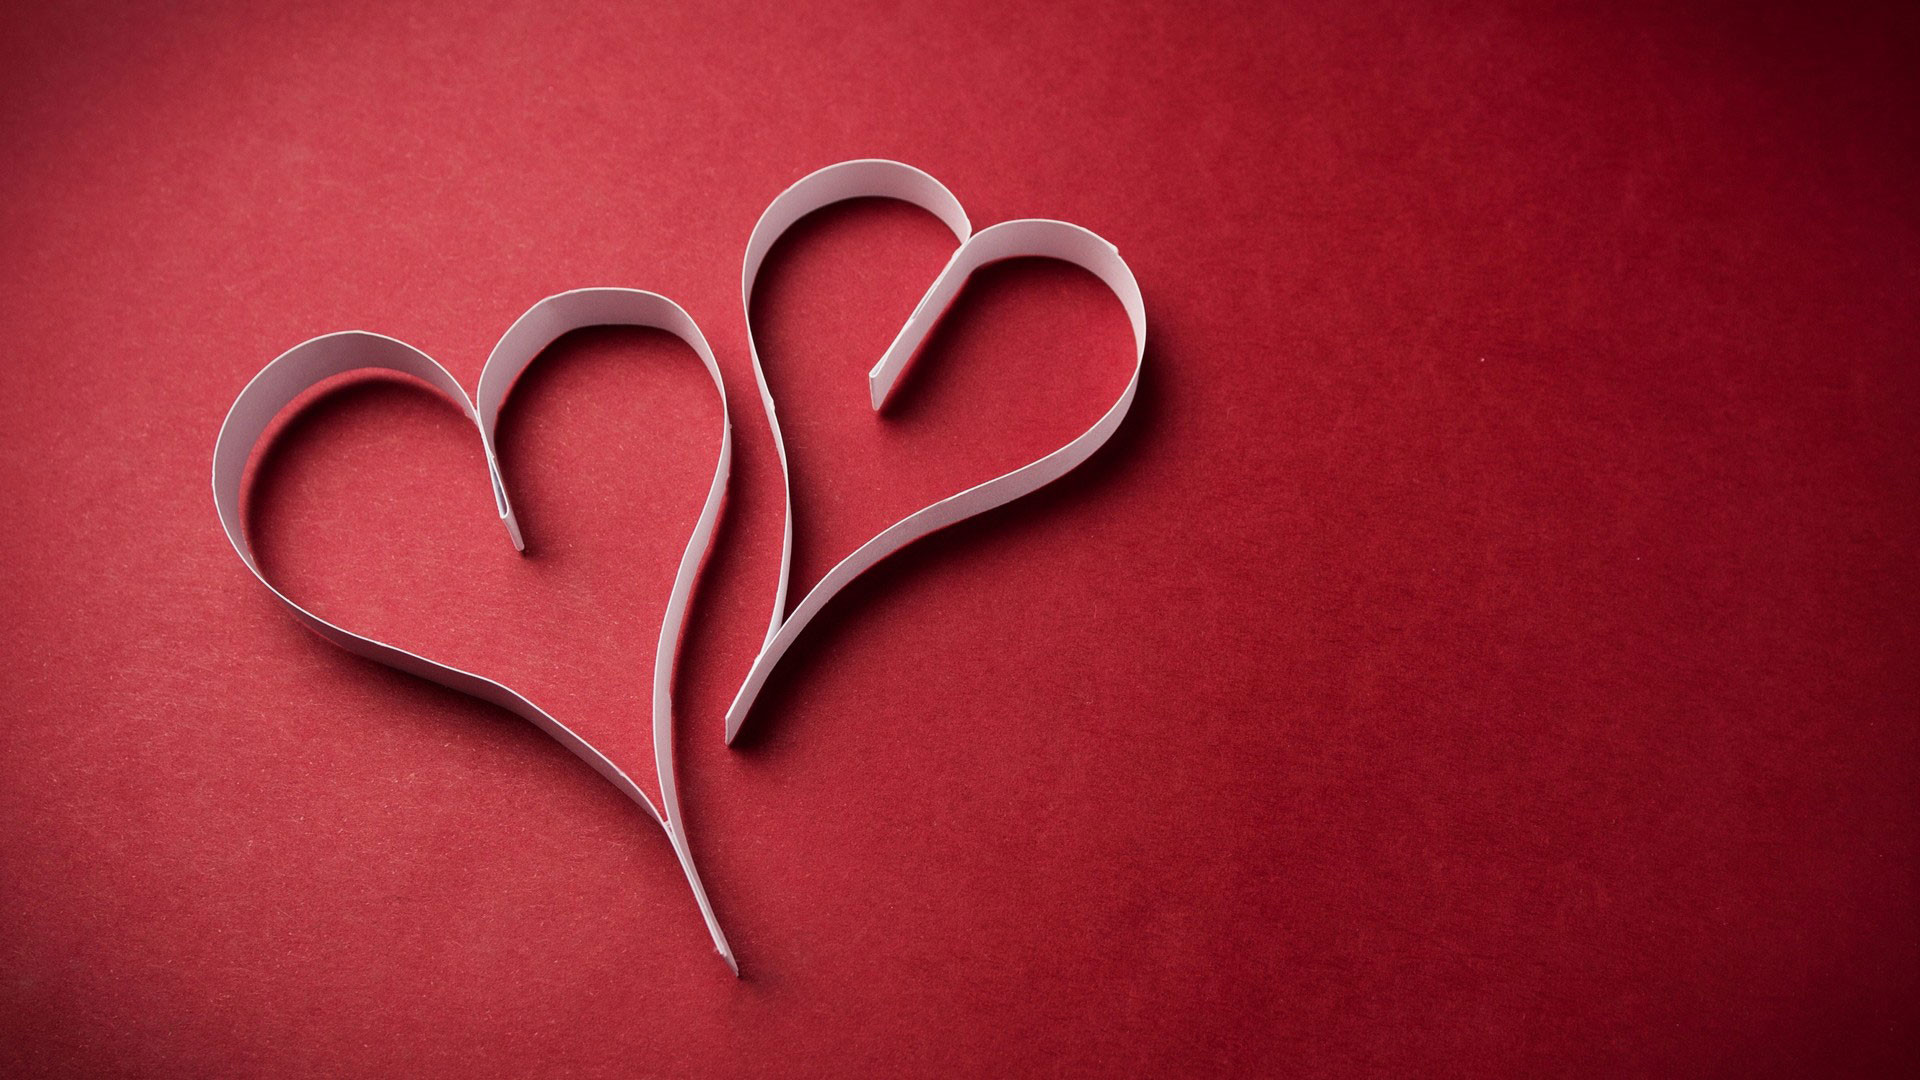 hd pics photos stunning attractive two hearts 25 hd desktop background  wallpaper